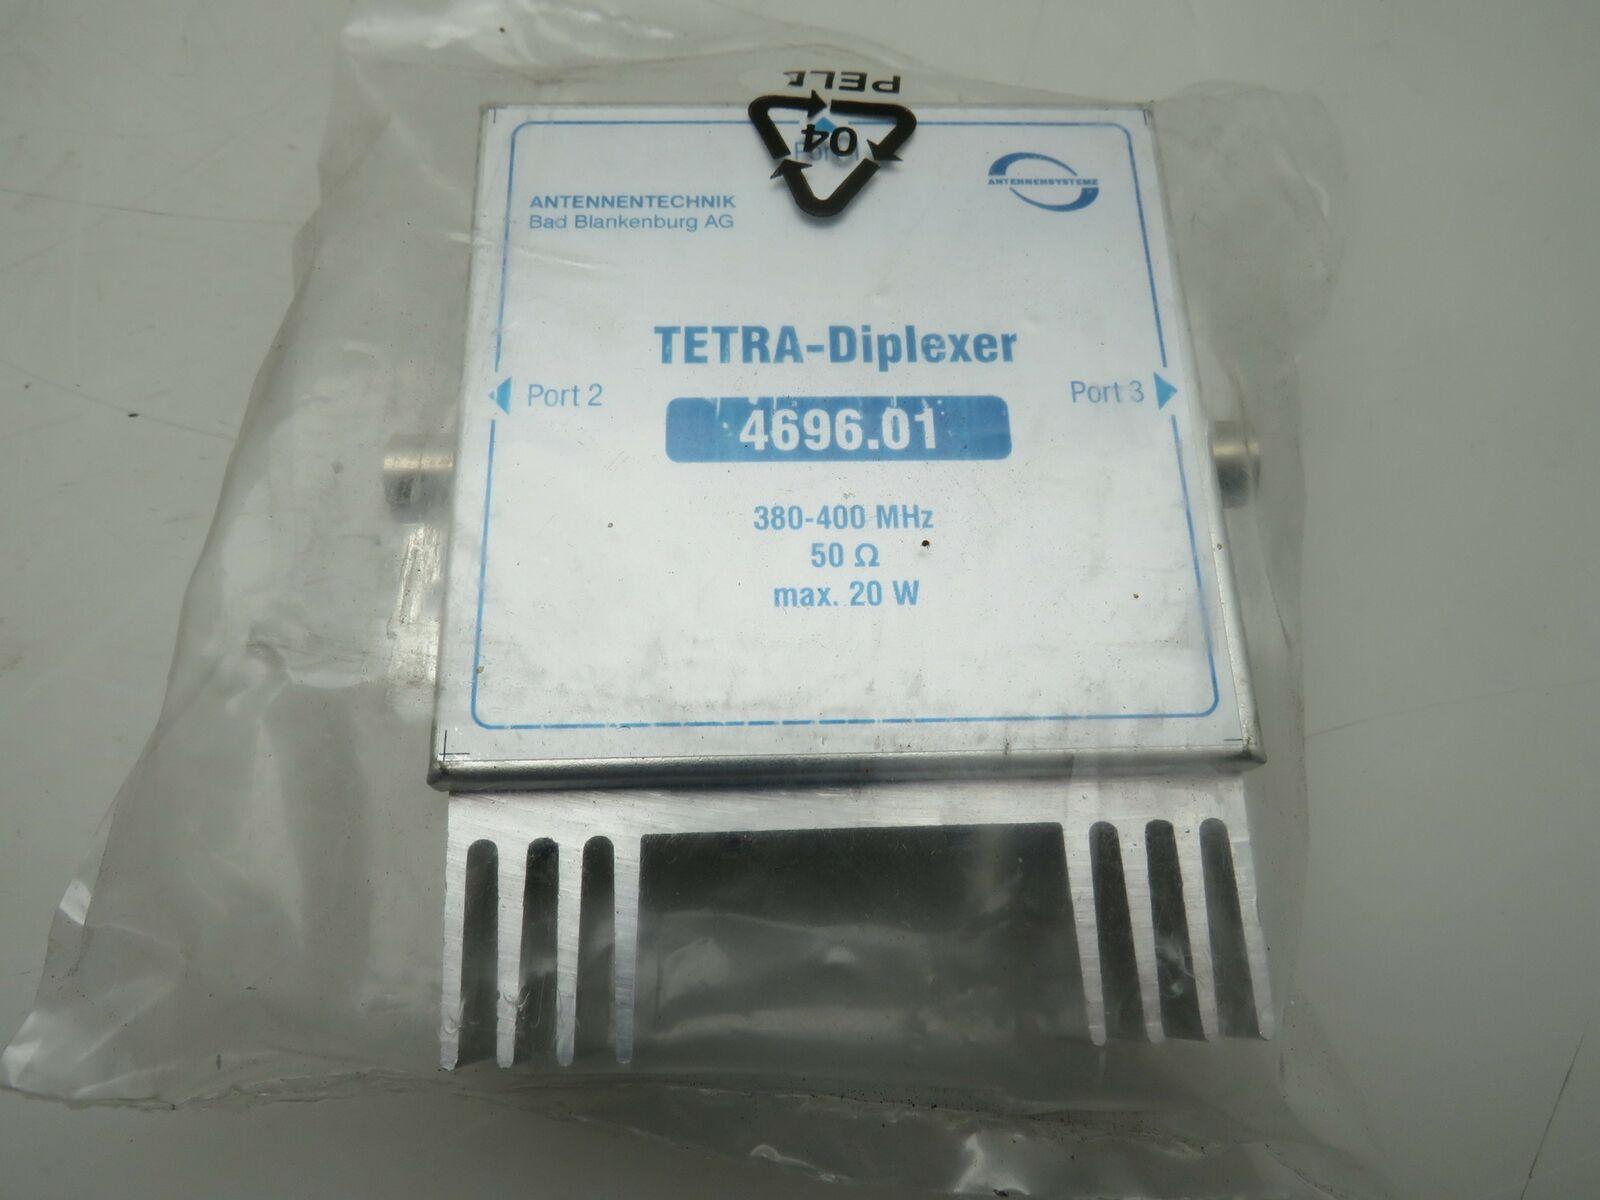 Tetra Diplexer Antennenweiche BOS Funk 4696.01 3xFME Anschluss 380-400Mhz